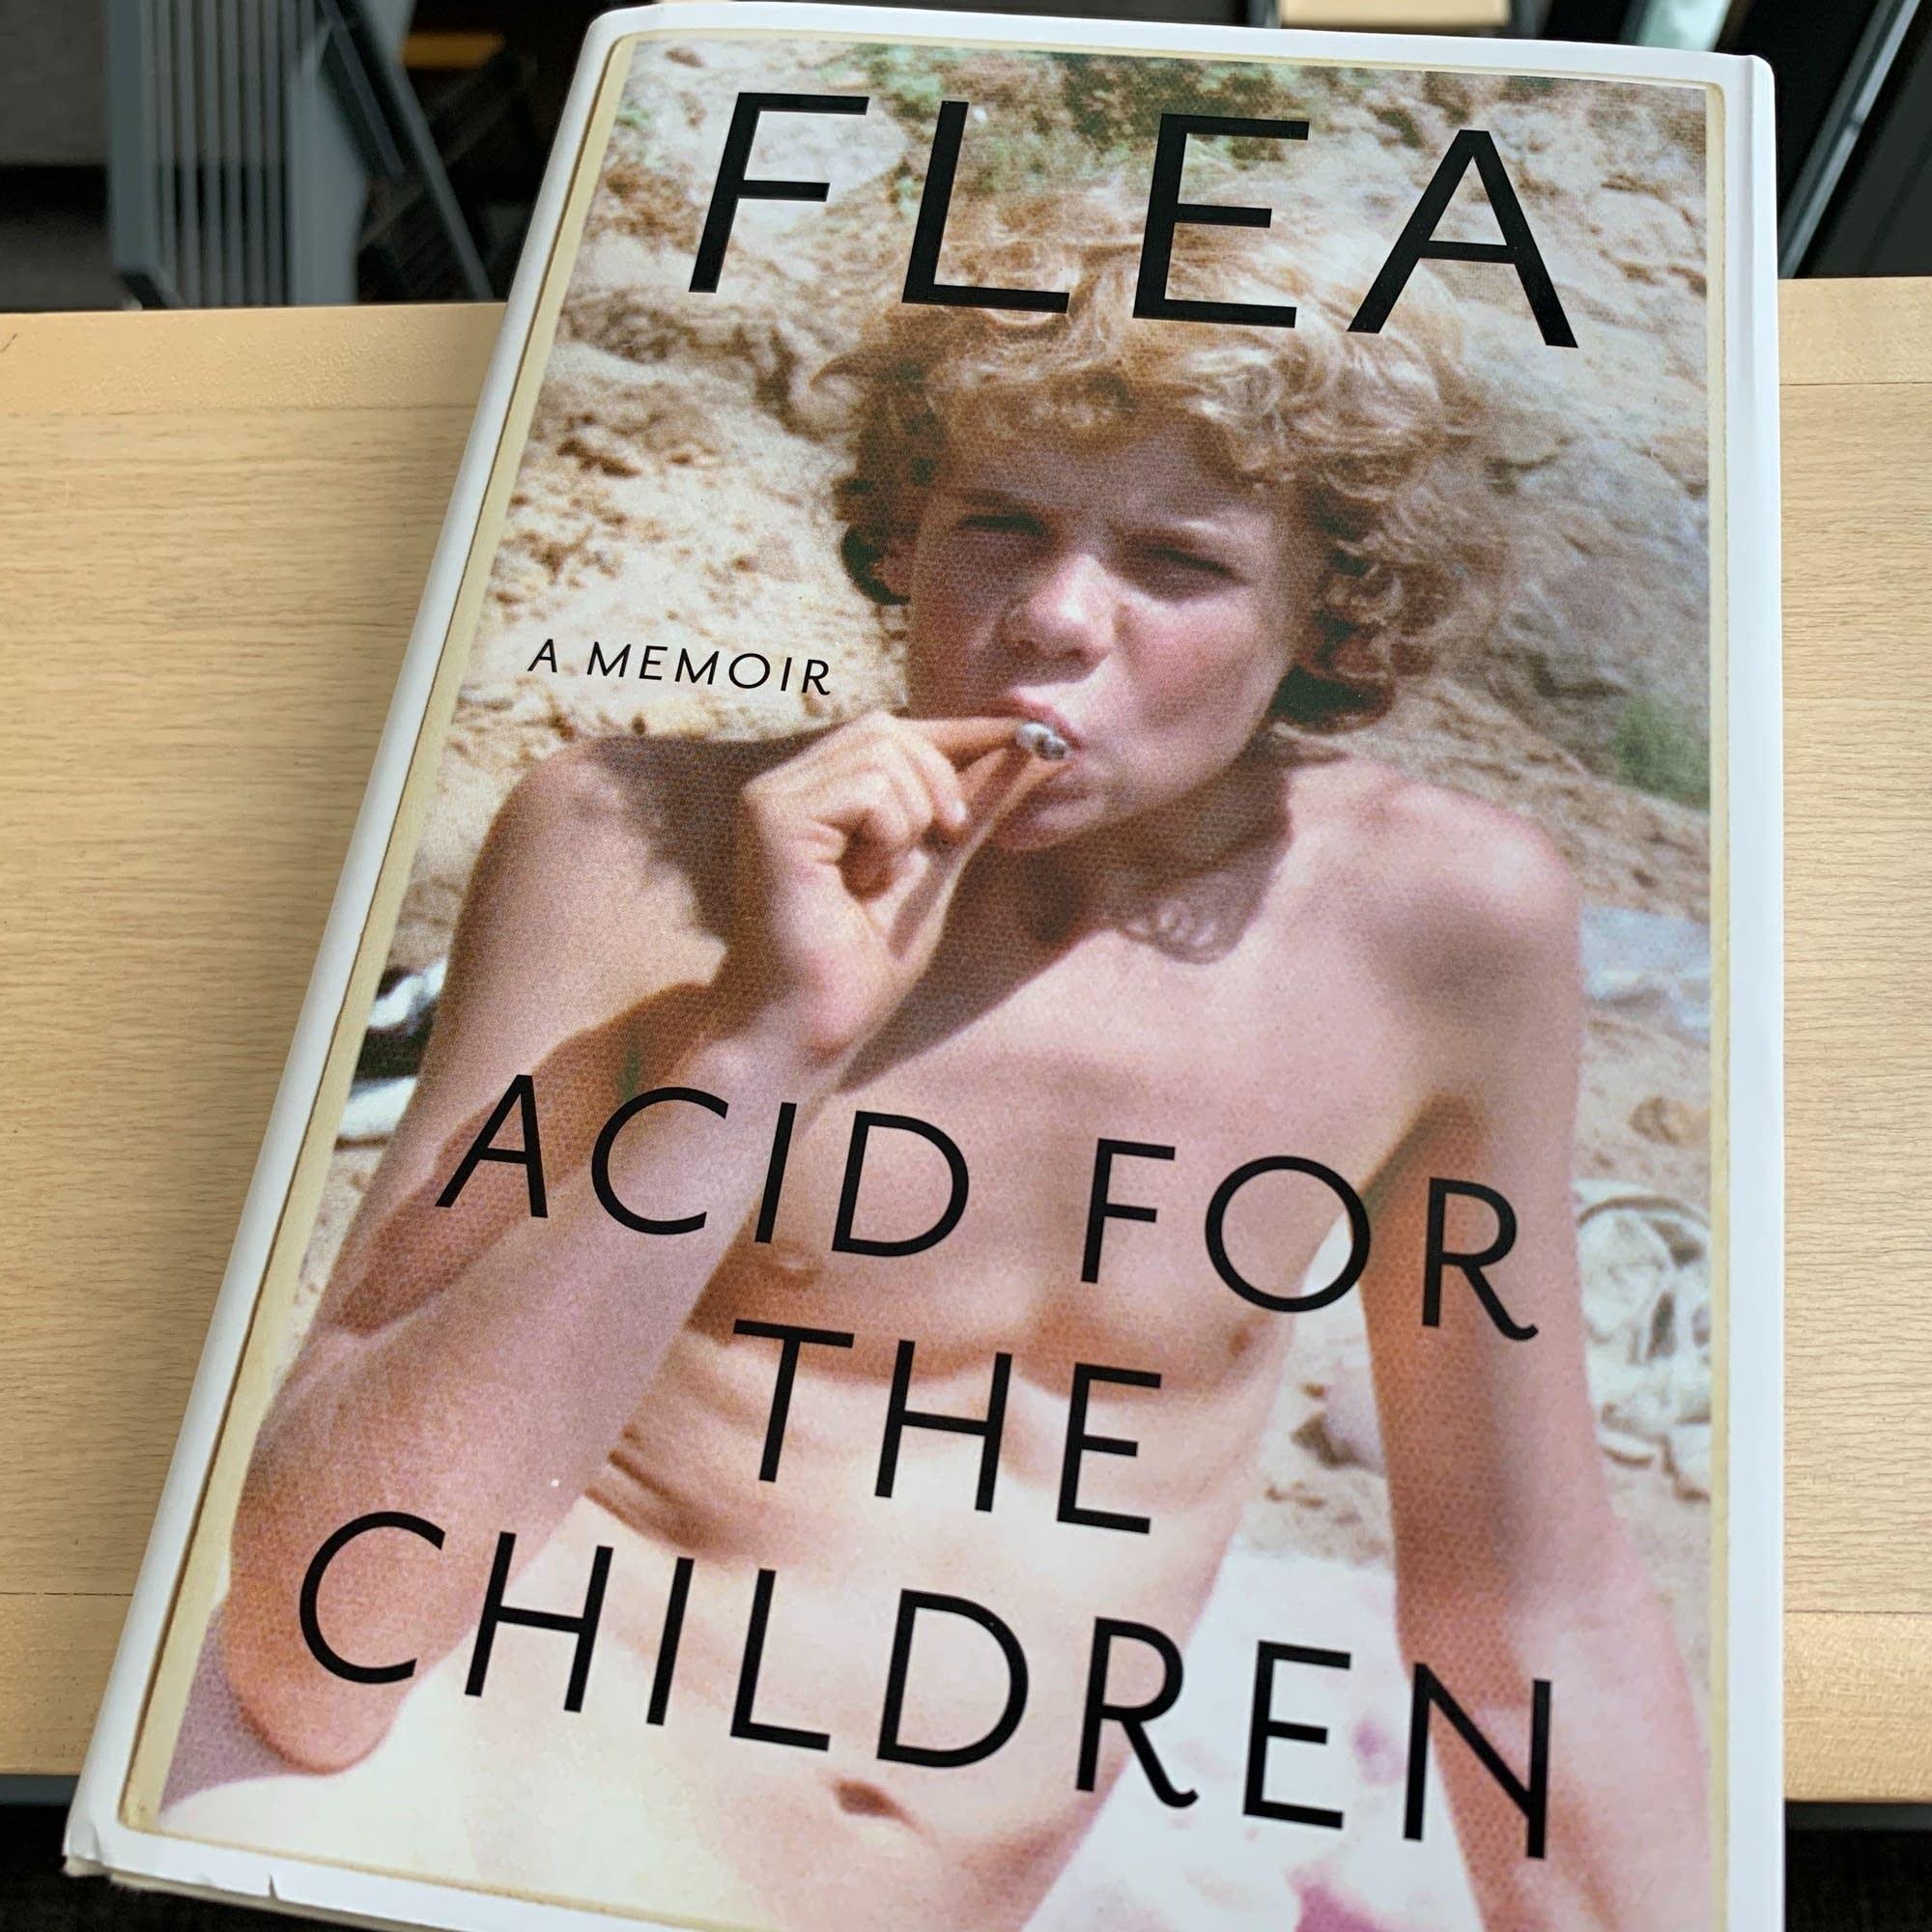 Flea's 'Acid for the Children.'